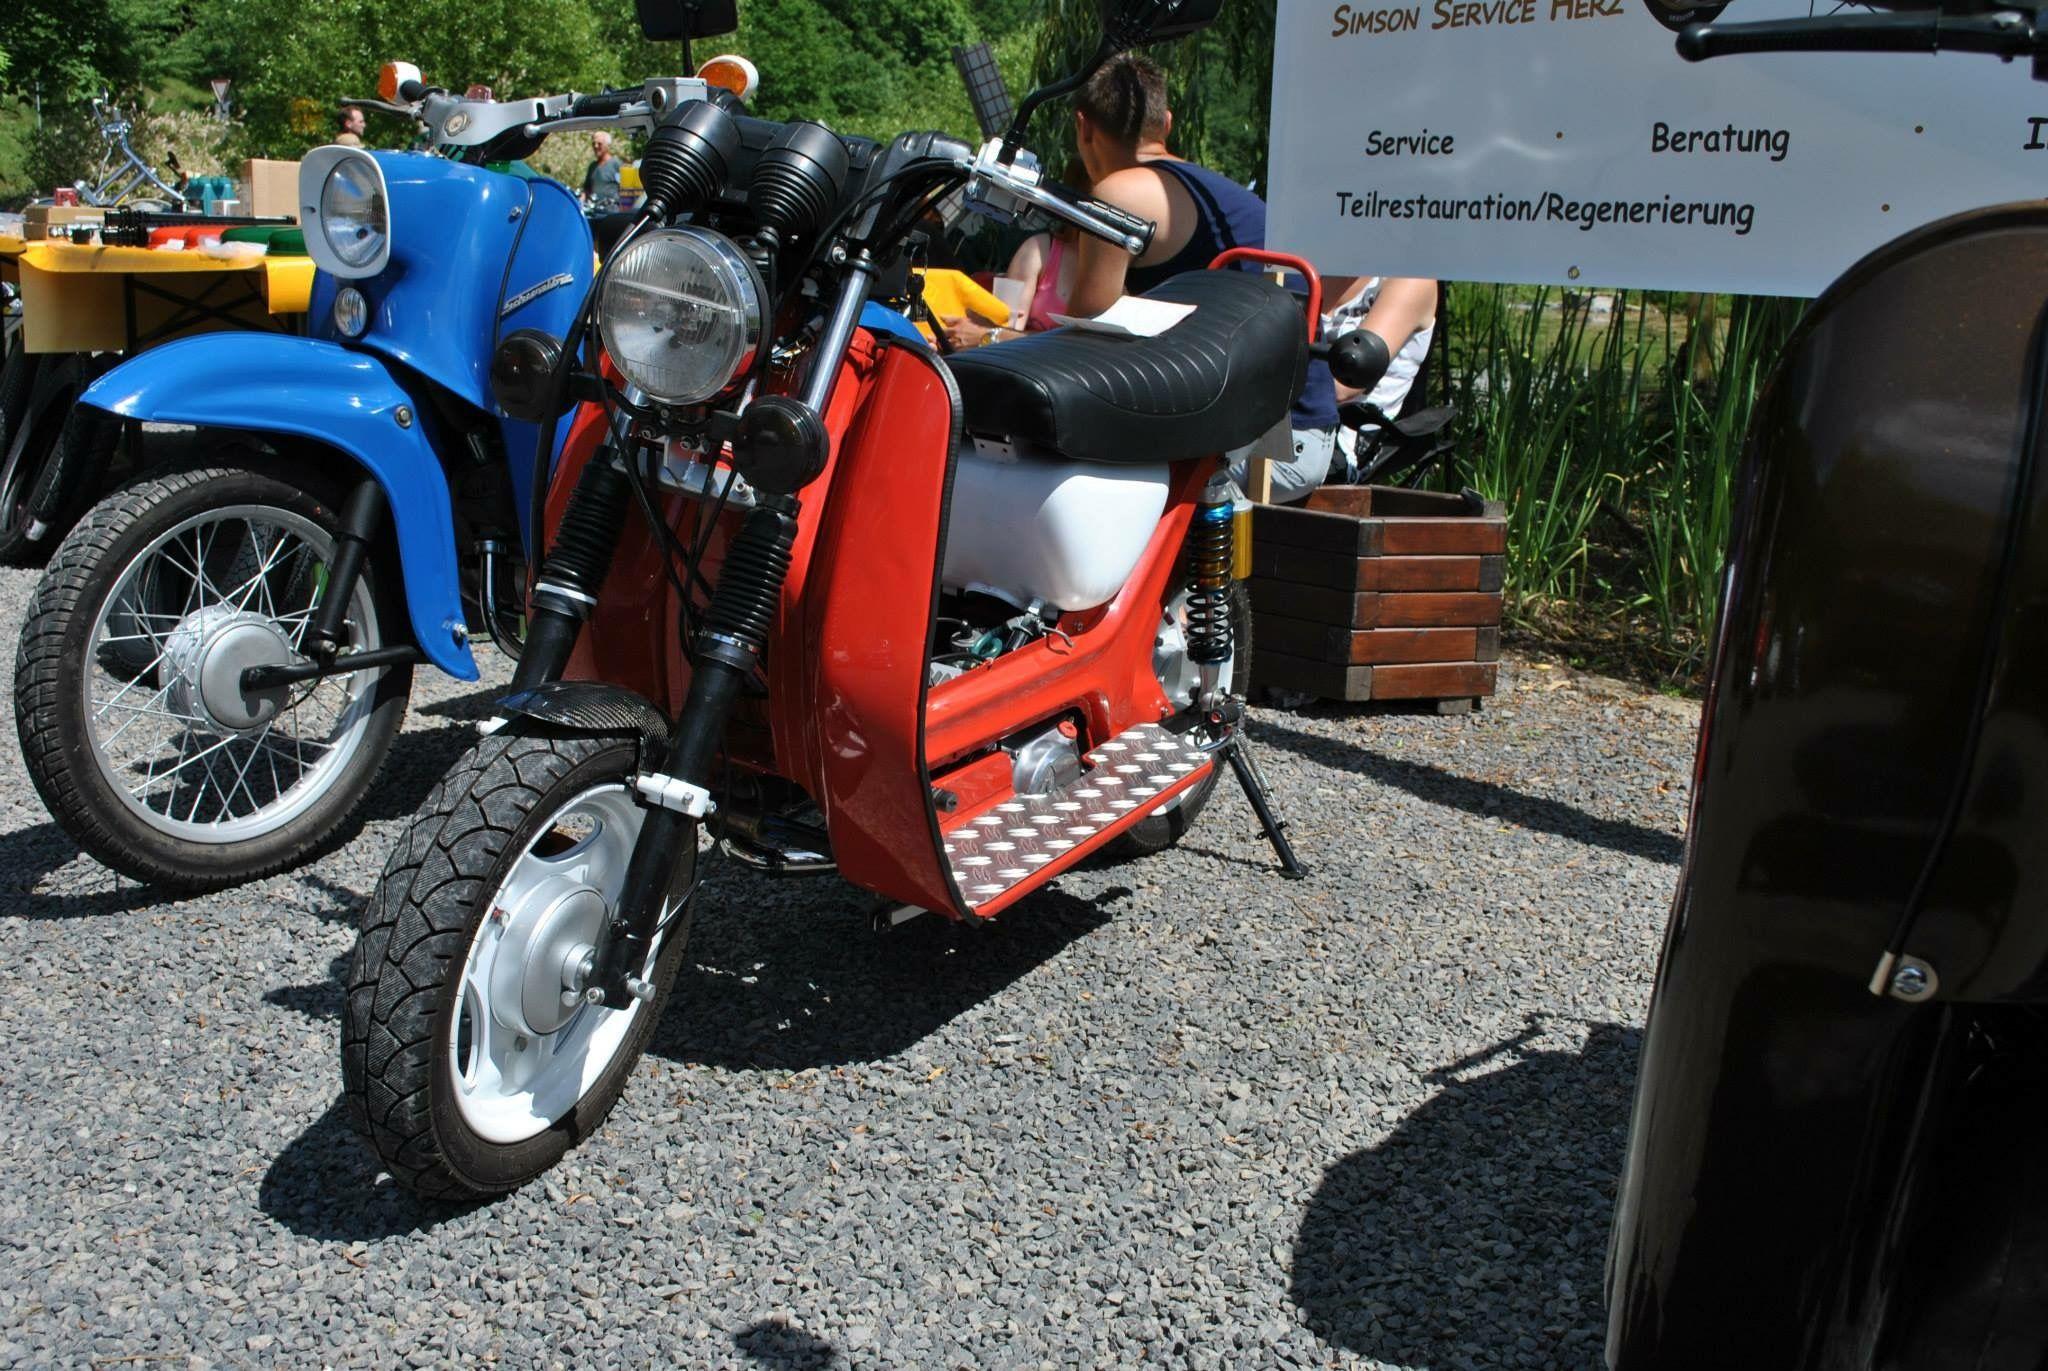 simson sr50 custom motorcycles from th ringen pinterest. Black Bedroom Furniture Sets. Home Design Ideas